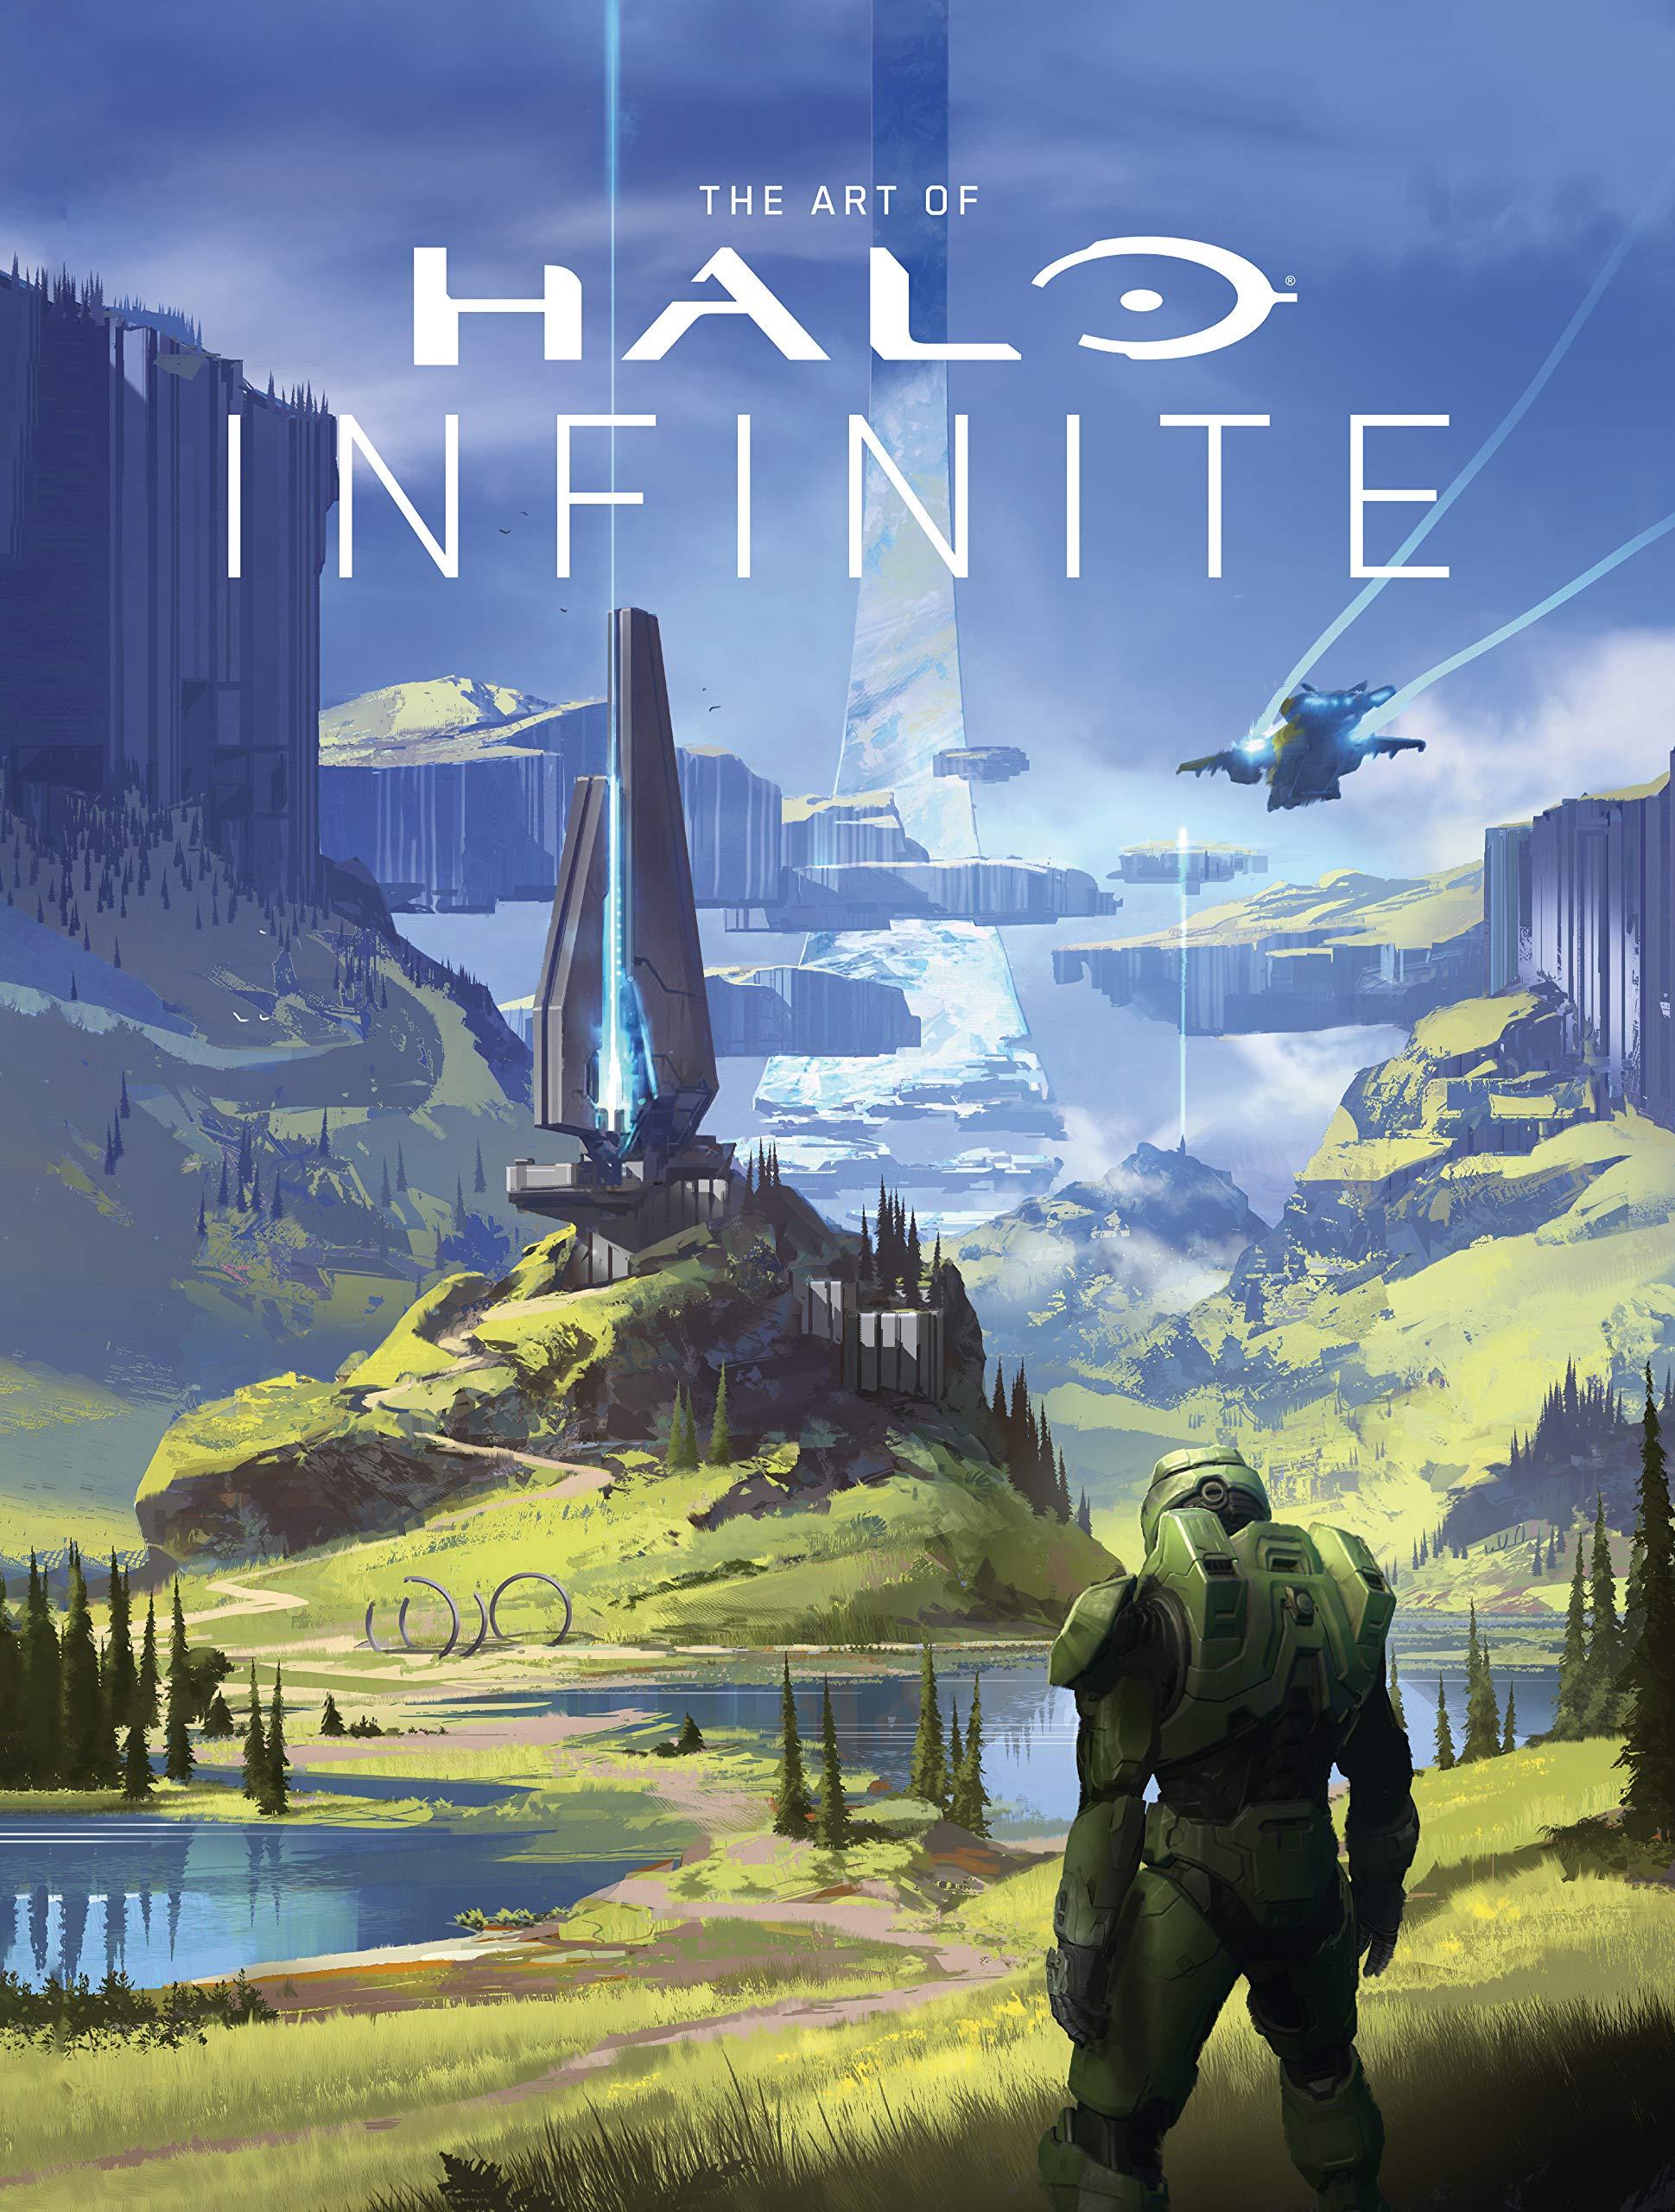 Amazon.com: The Art of Halo Infinite (9781506720081): 343 Industries: Books